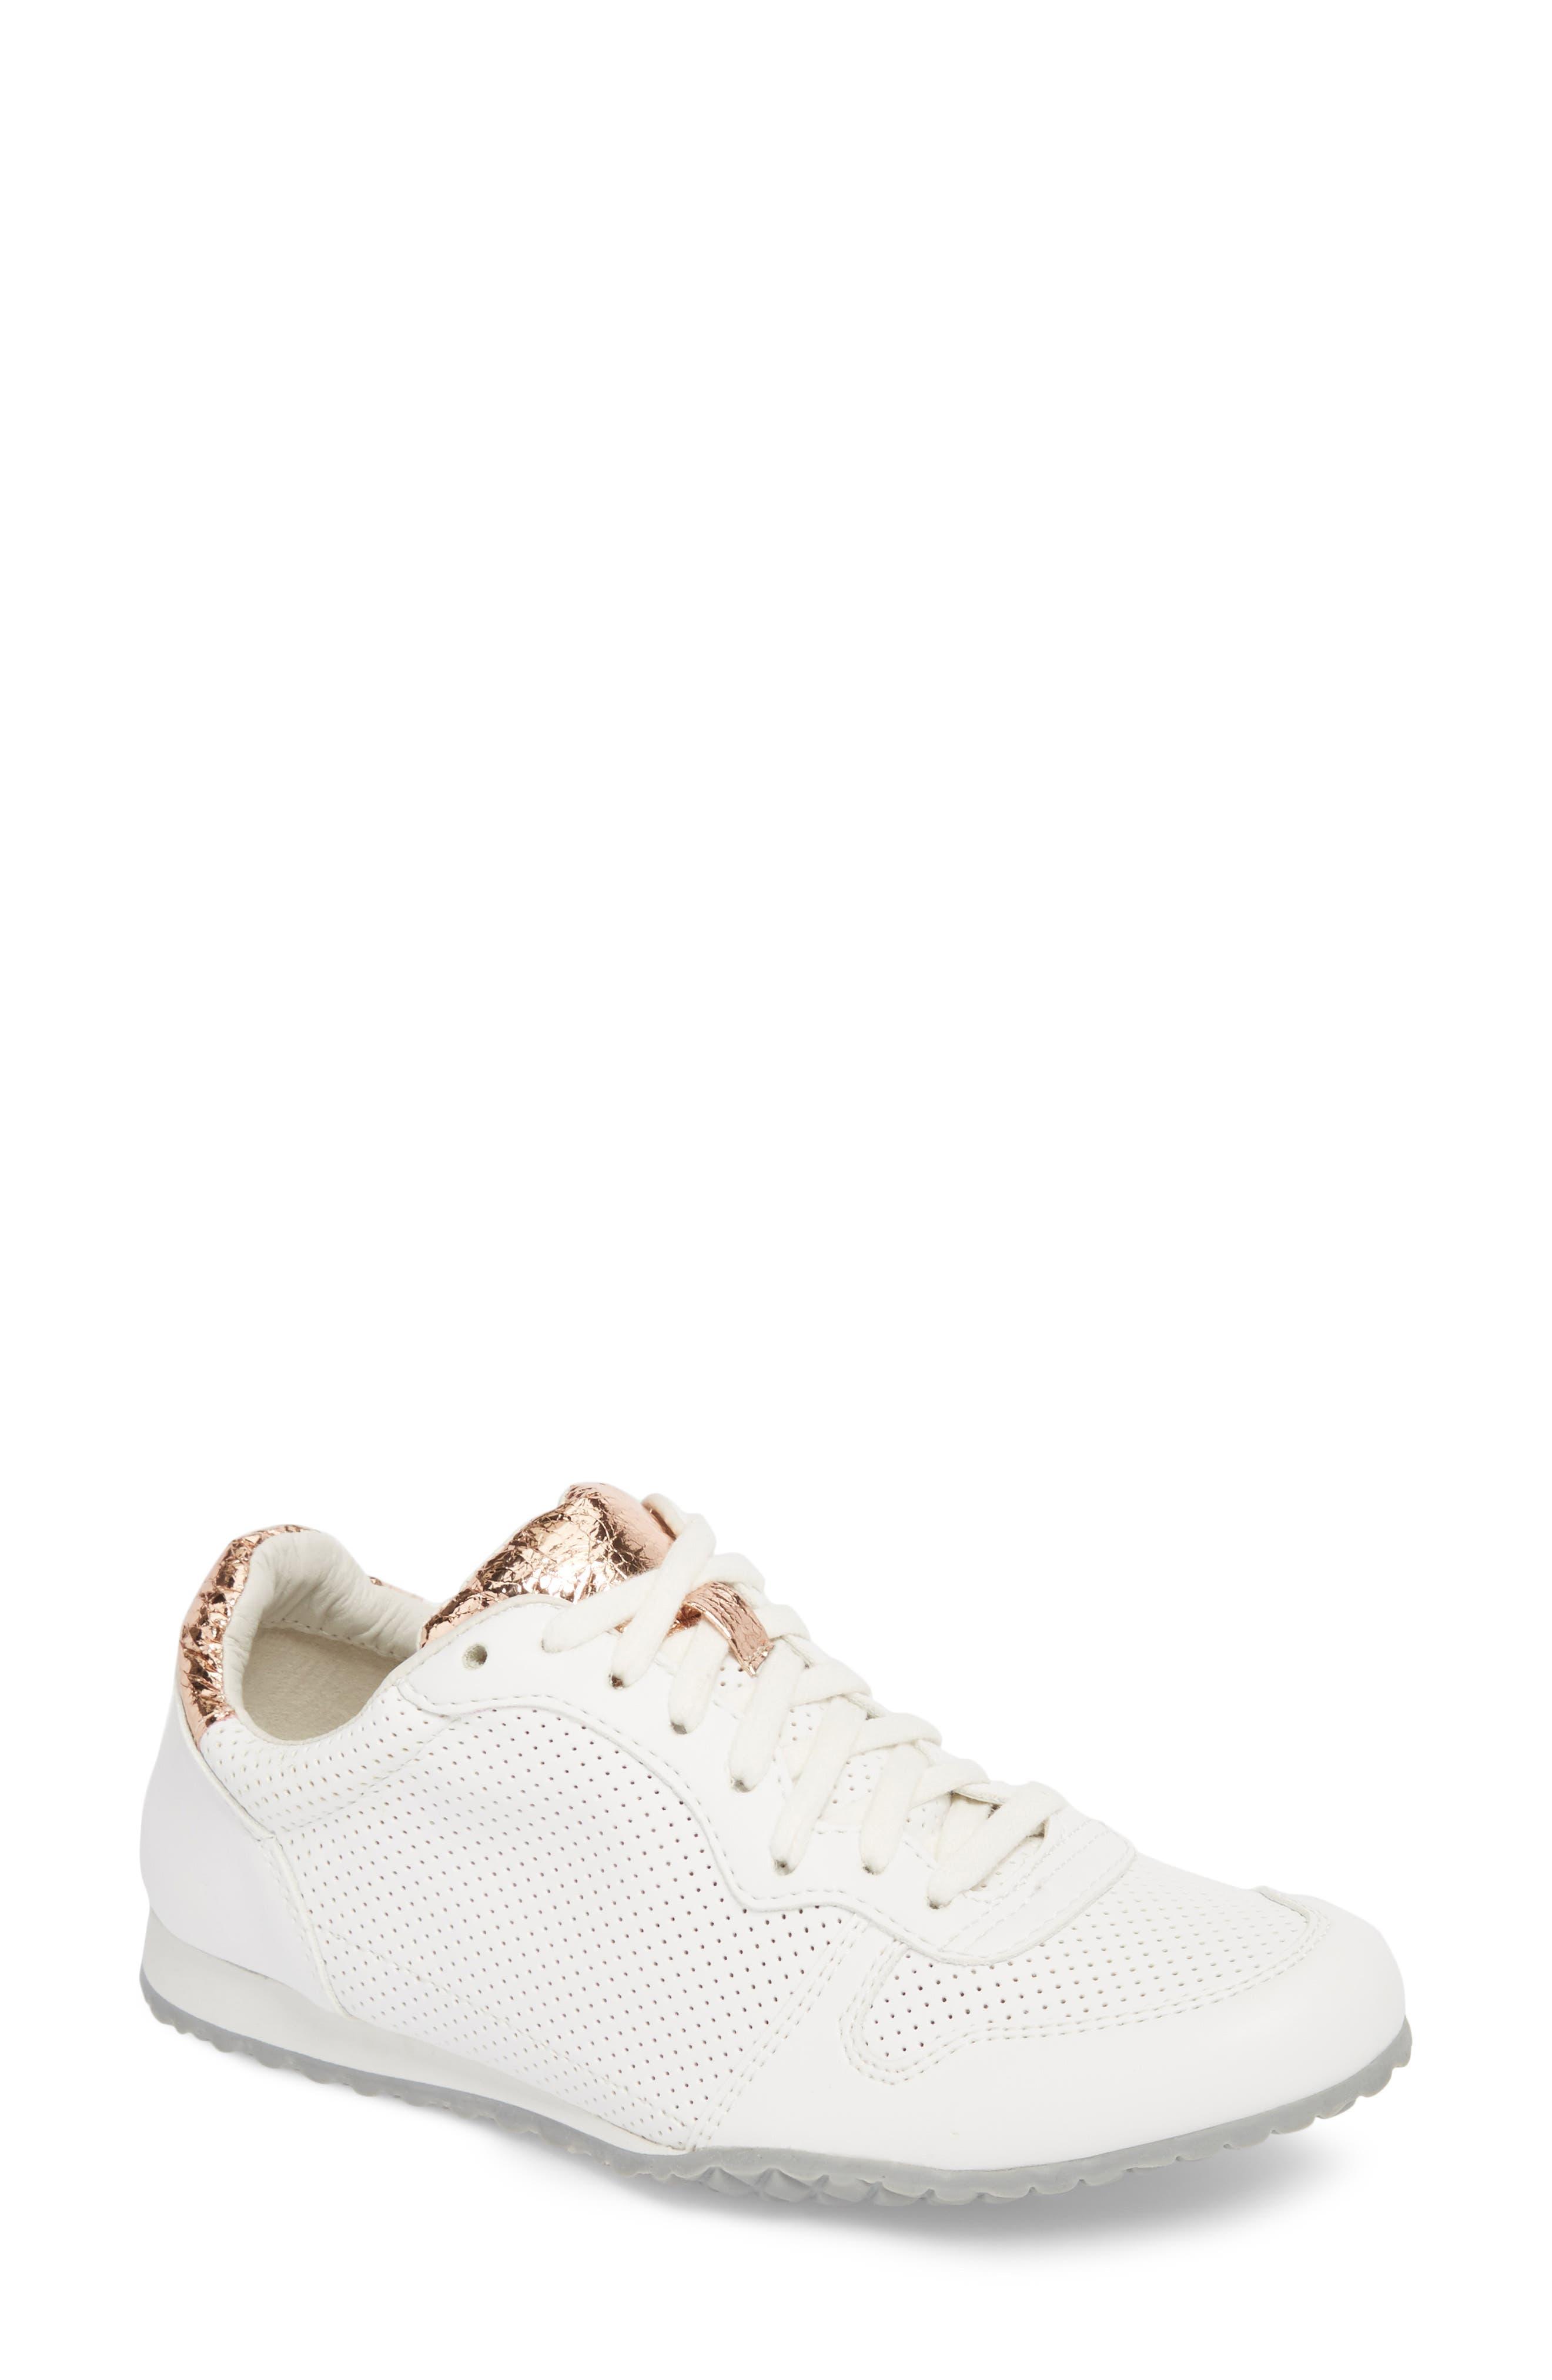 Joanna Perforated Sneaker,                             Main thumbnail 1, color,                             124